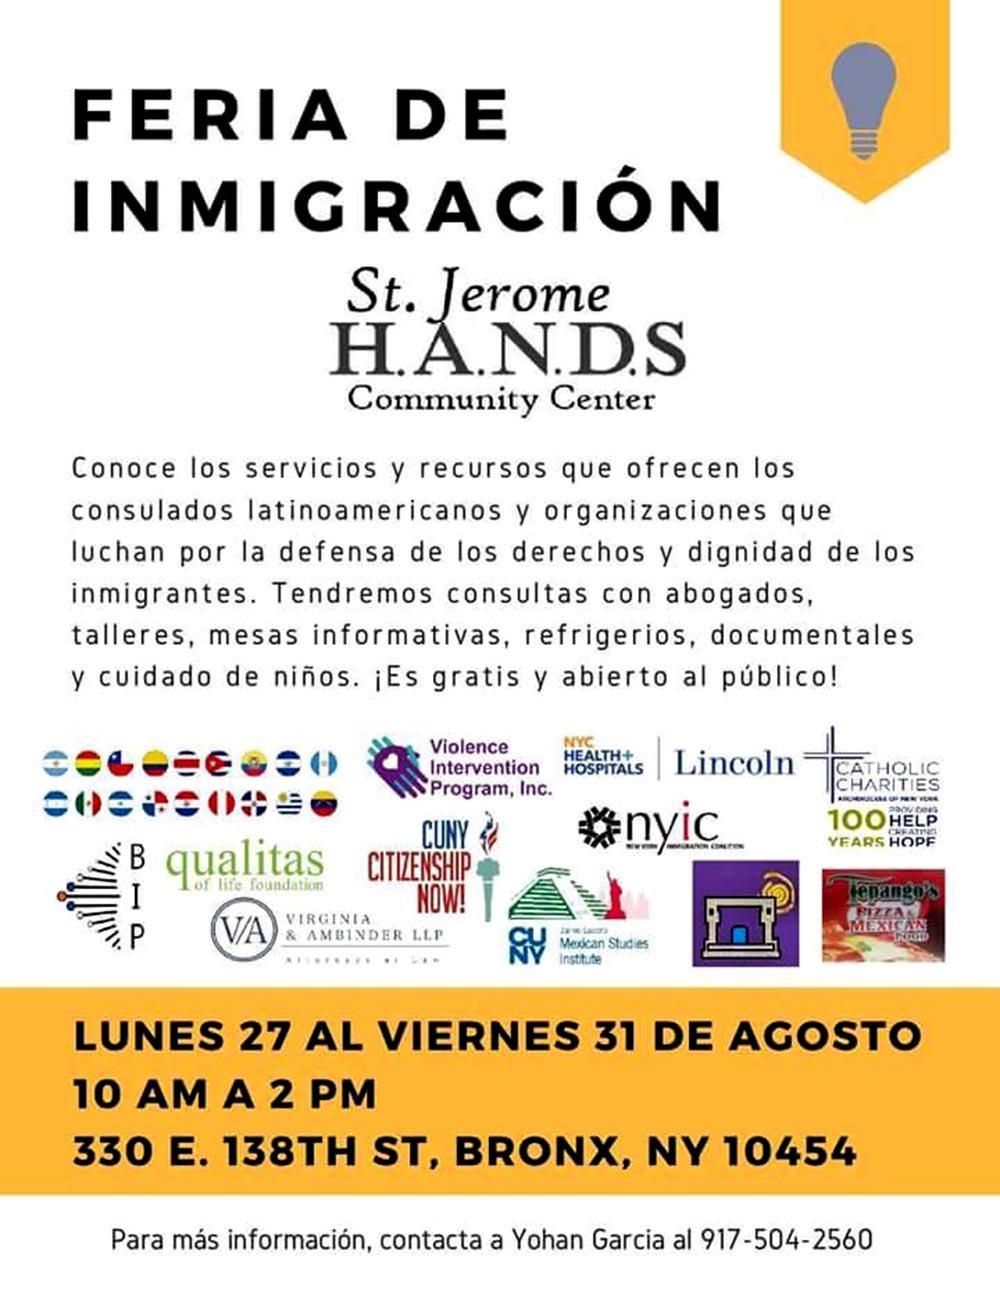 Hands Feria de Inmigracion